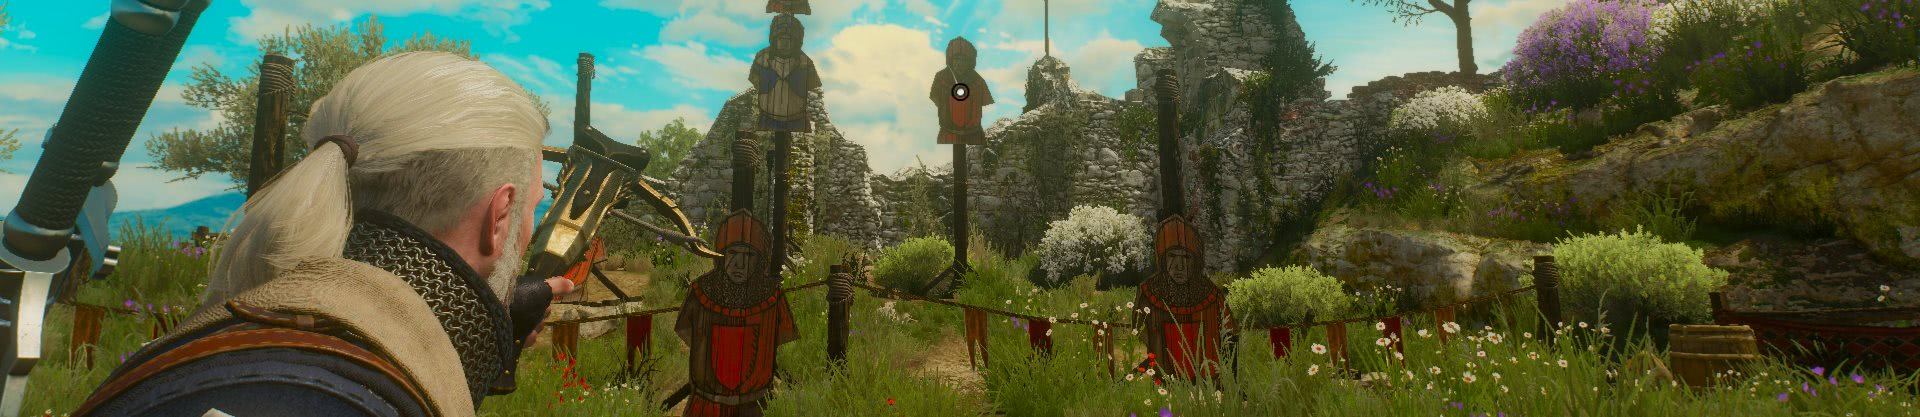 witcher3 Песнь рыцарского сердца арбалет